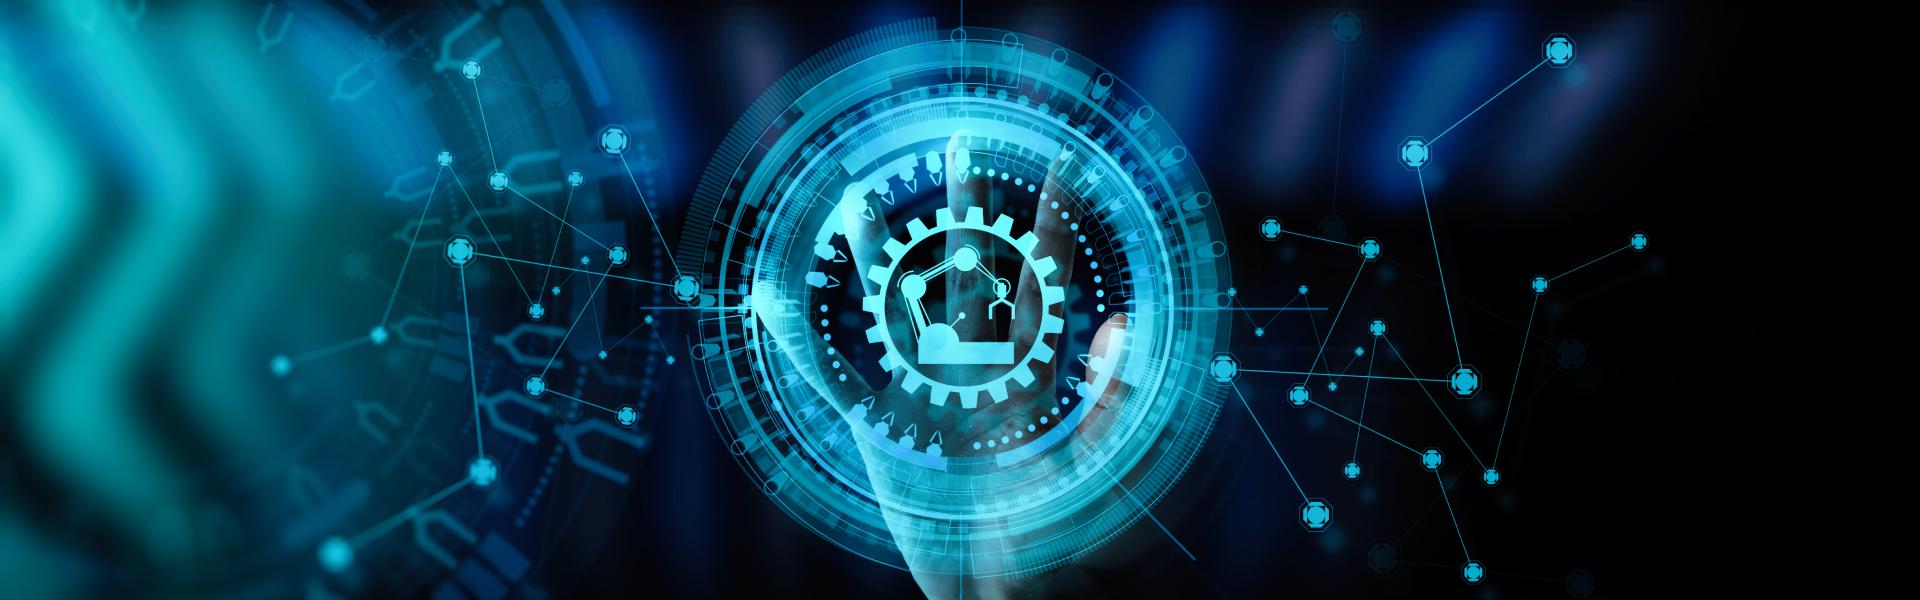 Caffe vs TensorFlow: What's Best 🥇 for Enterprise Machine